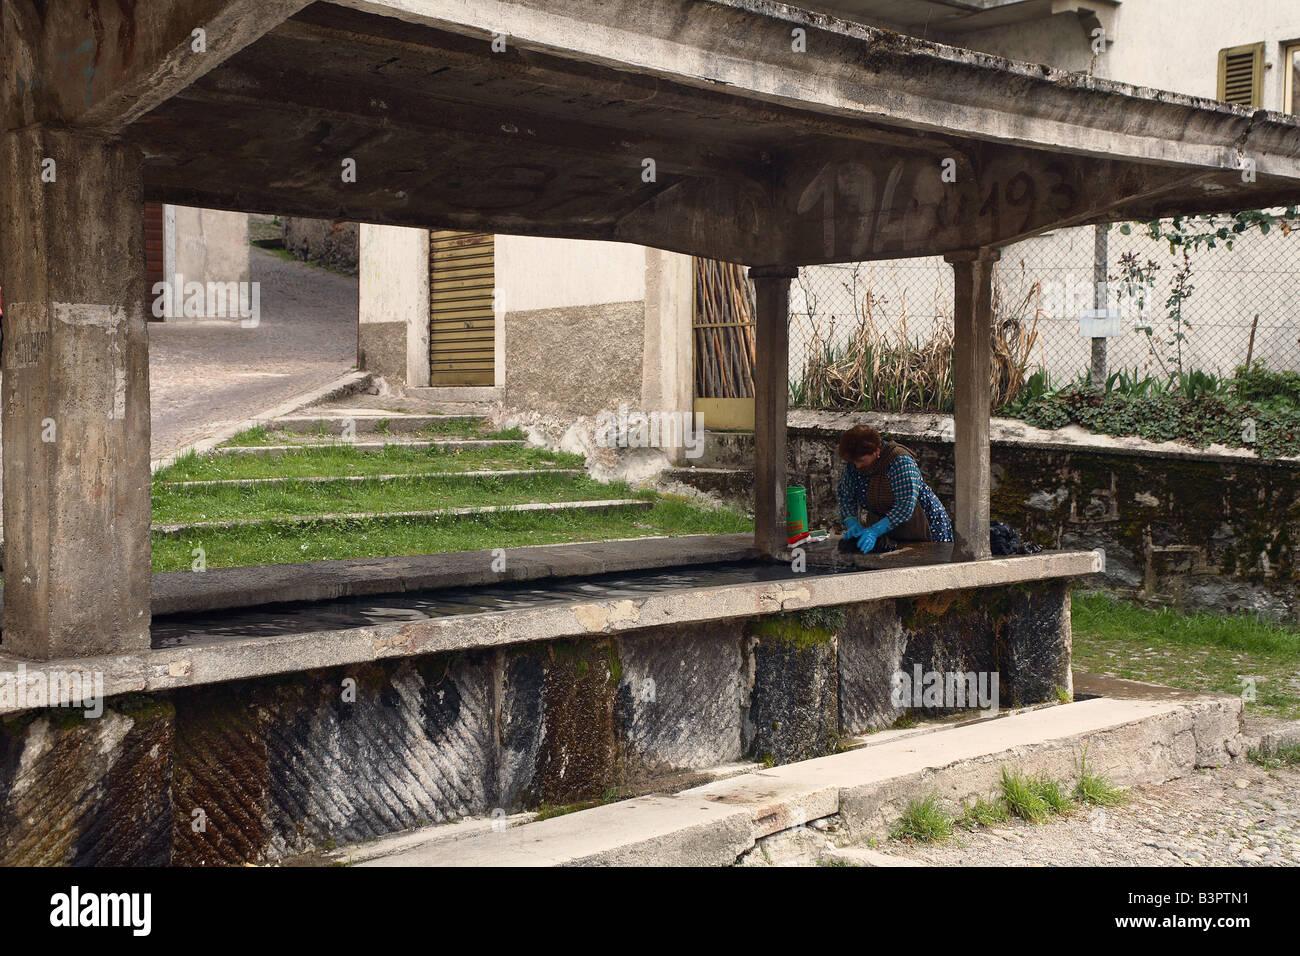 Washing, Bagolino, Lombardy, Italy - Stock Image